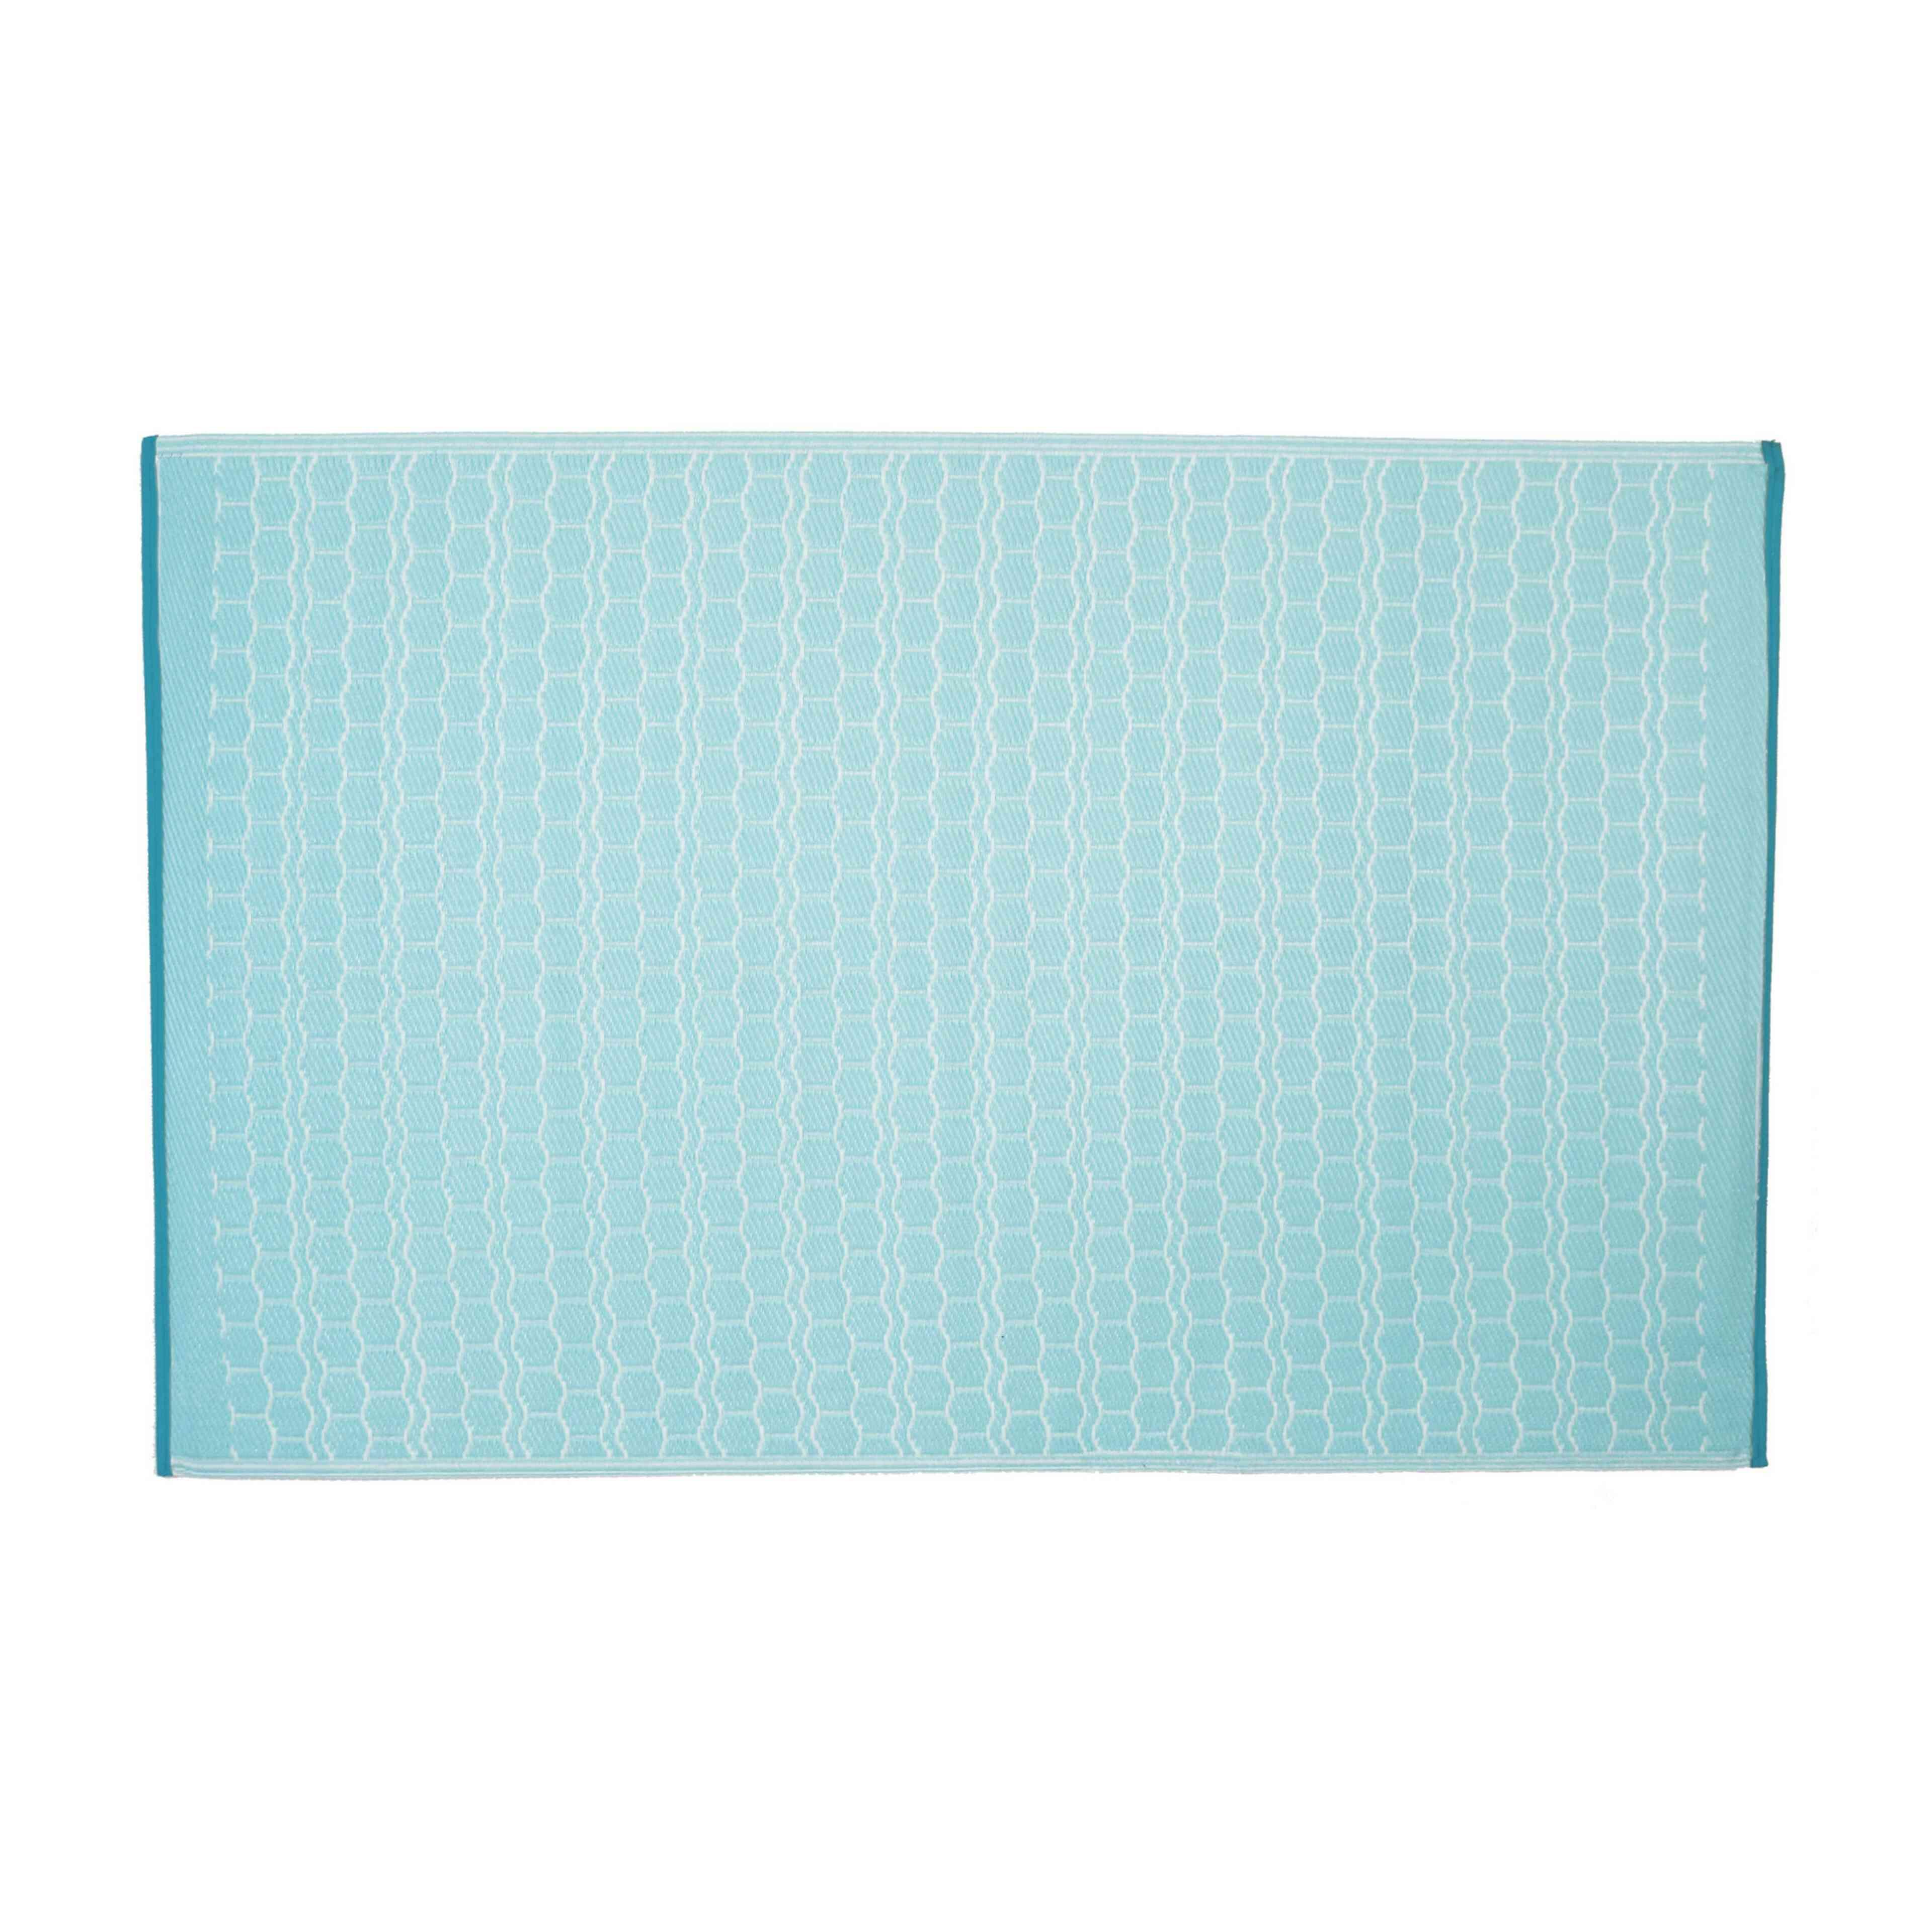 tapis ext rieur bleu pvc. Black Bedroom Furniture Sets. Home Design Ideas